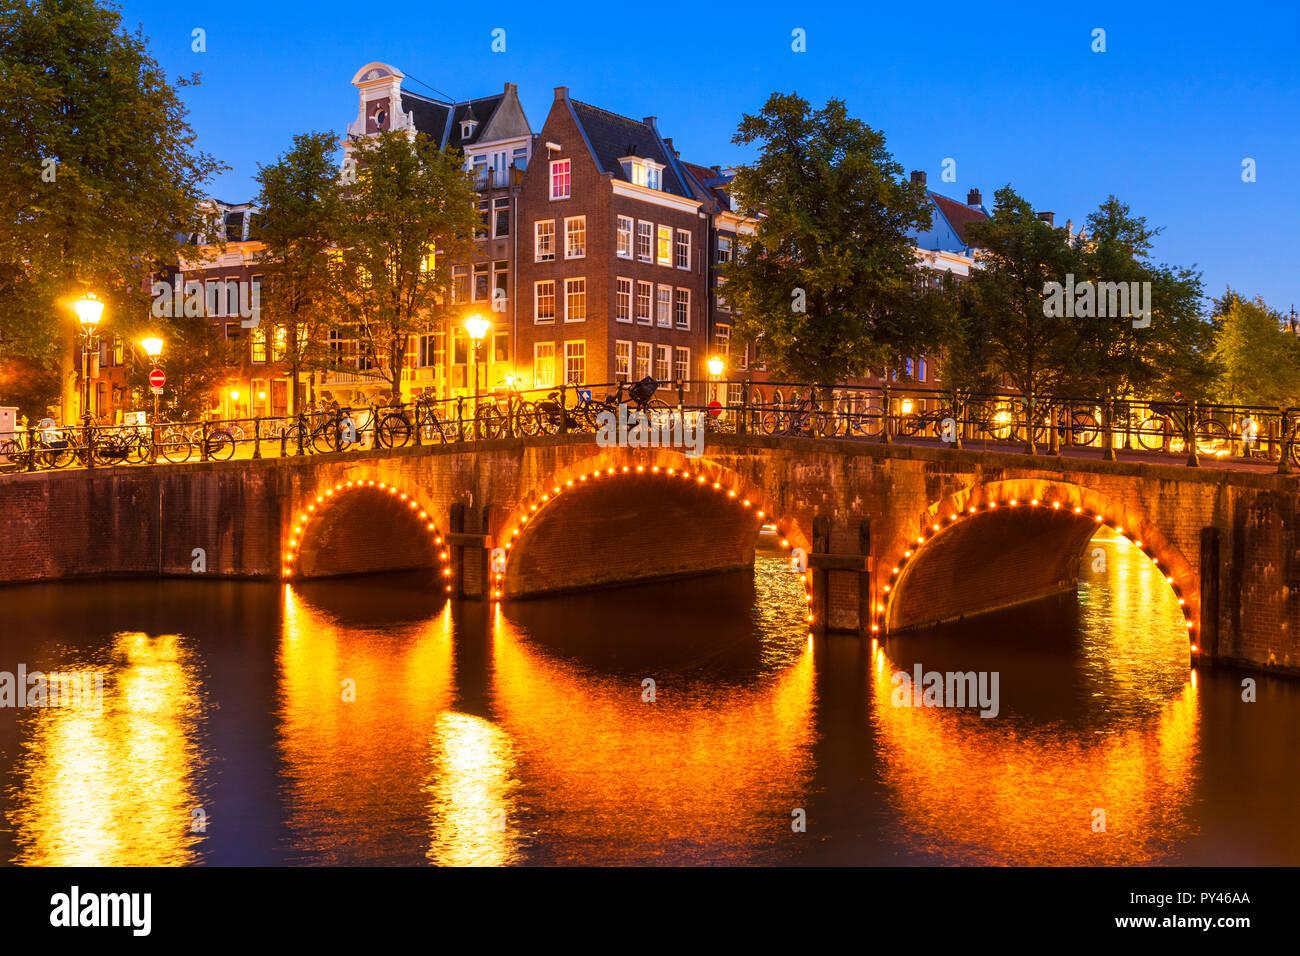 Amsterdam beleuchtete Kanalbrücke über Keizergraht Kanal und Leliegracht Brücke Amsterdam Holland Niederlande EU Europa Stockbild